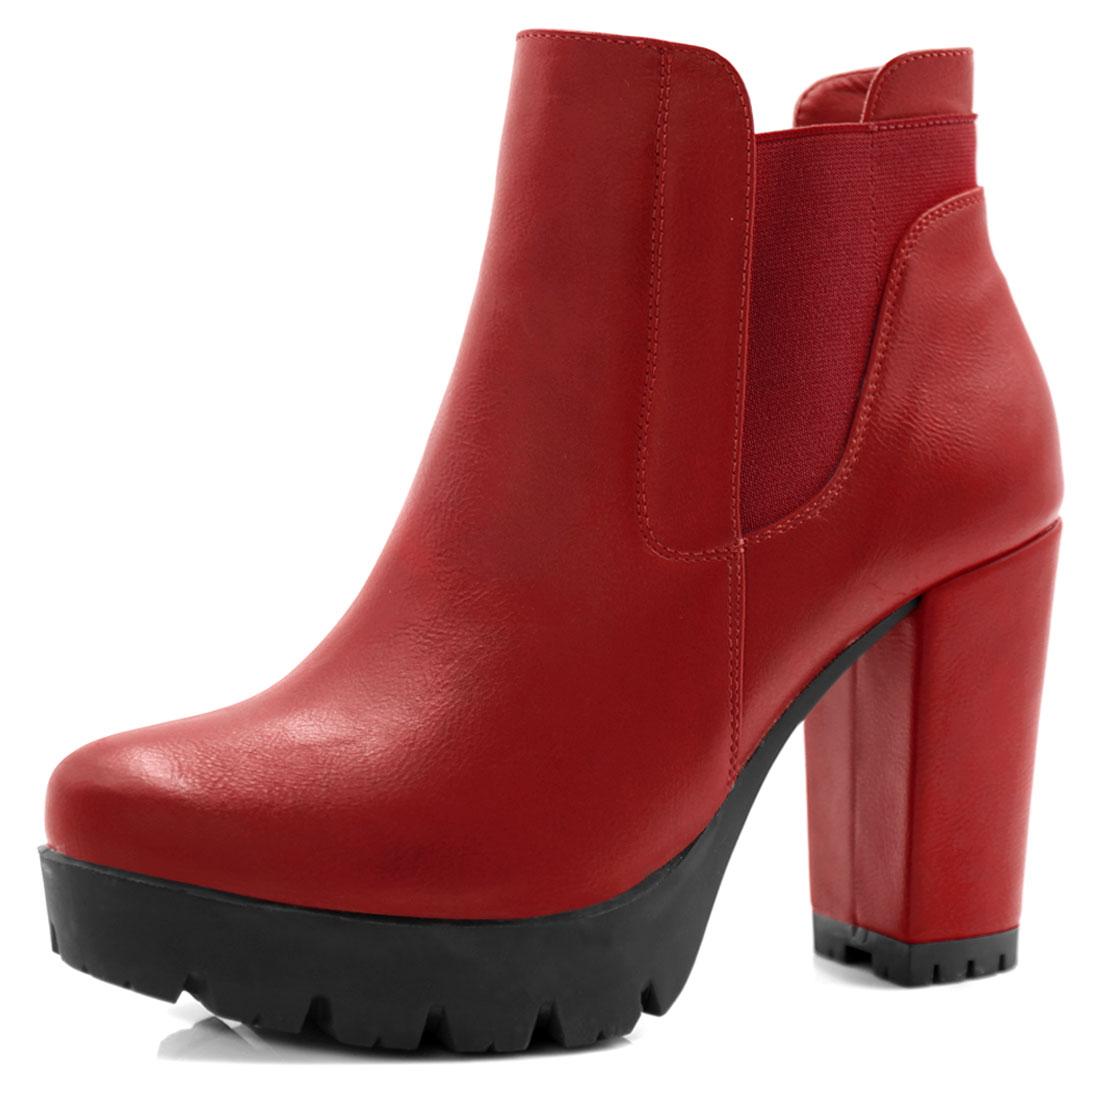 Allegra K Women Chunky High Heel Platform Zipper Chelsea Boots Red US 8.5